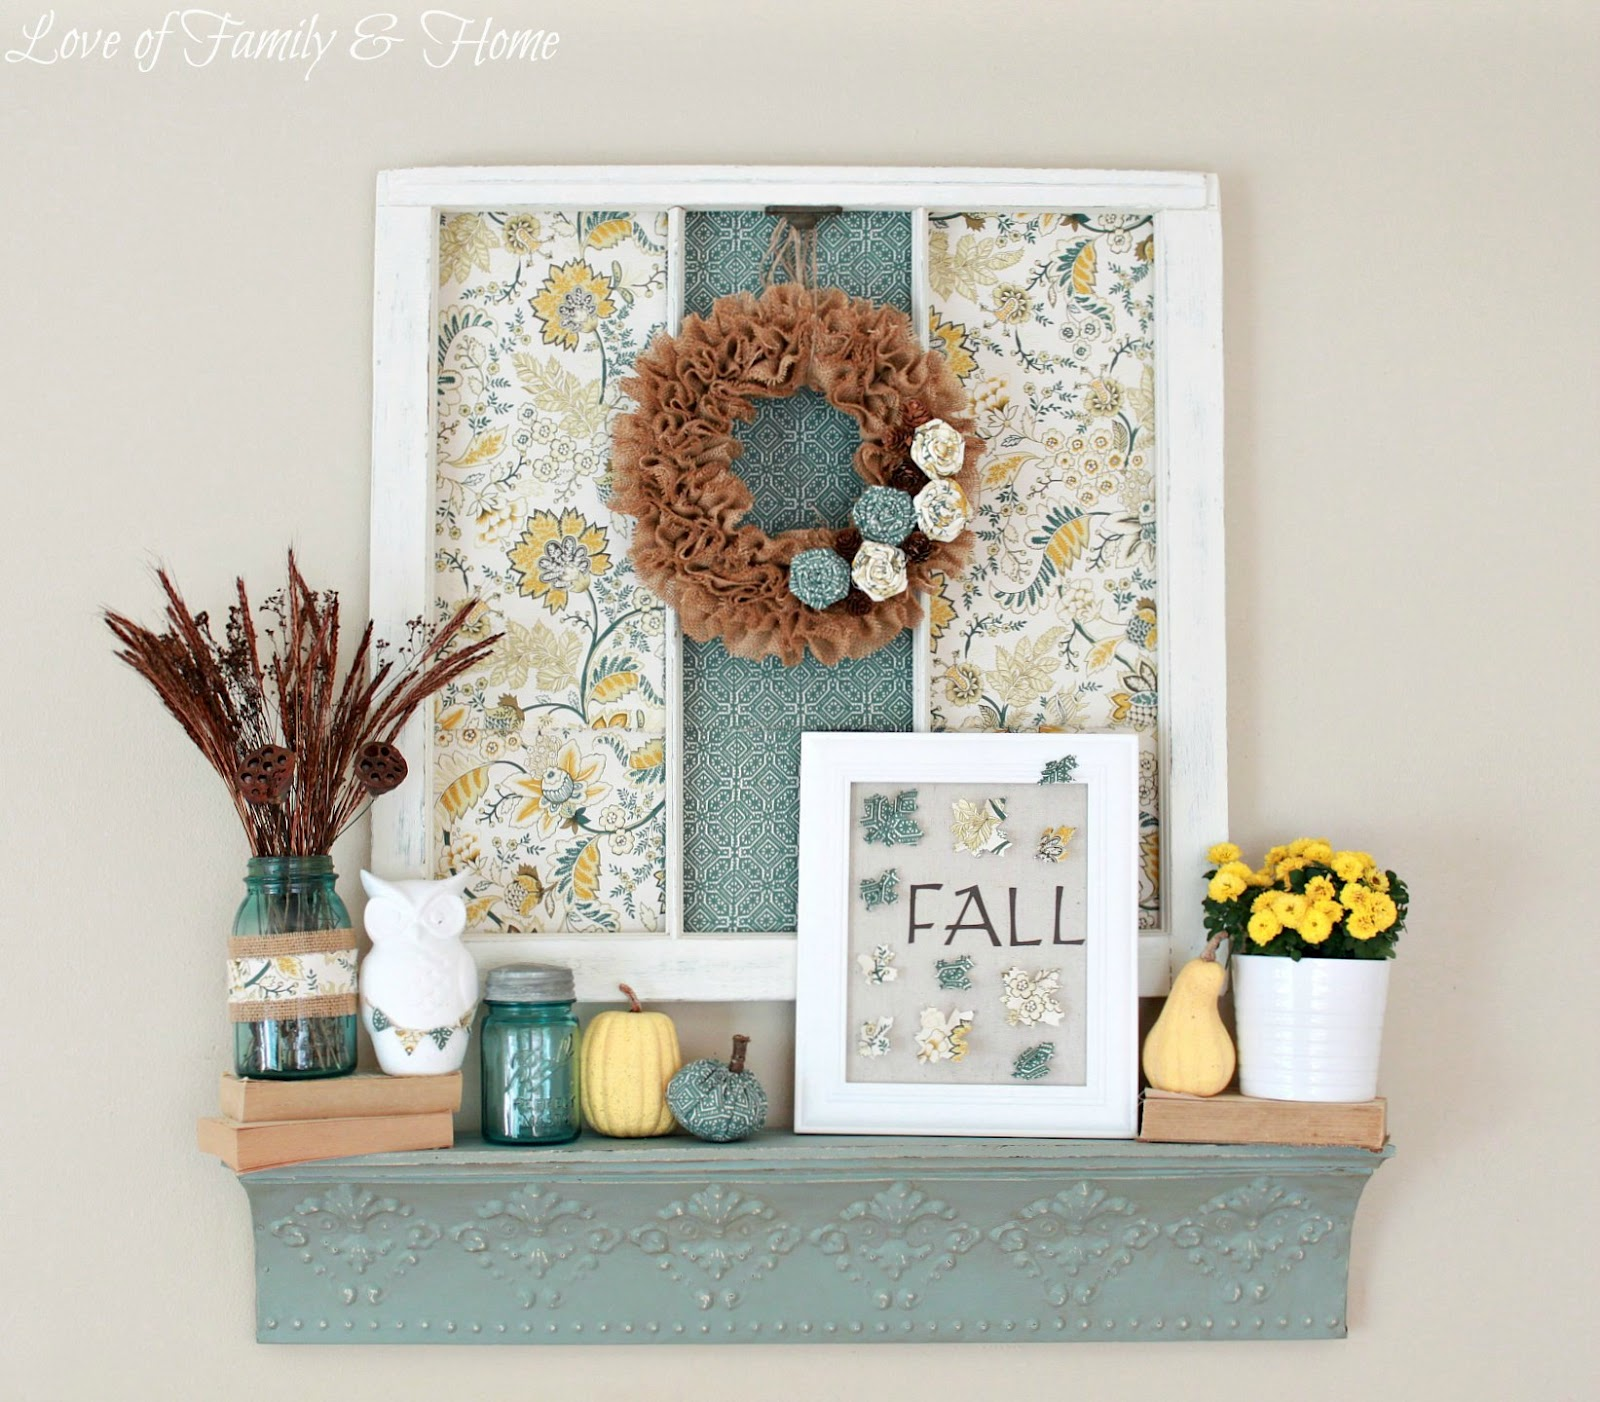 Teal (Aqua) & Yellow Fall Mantel - Love of Family & Home